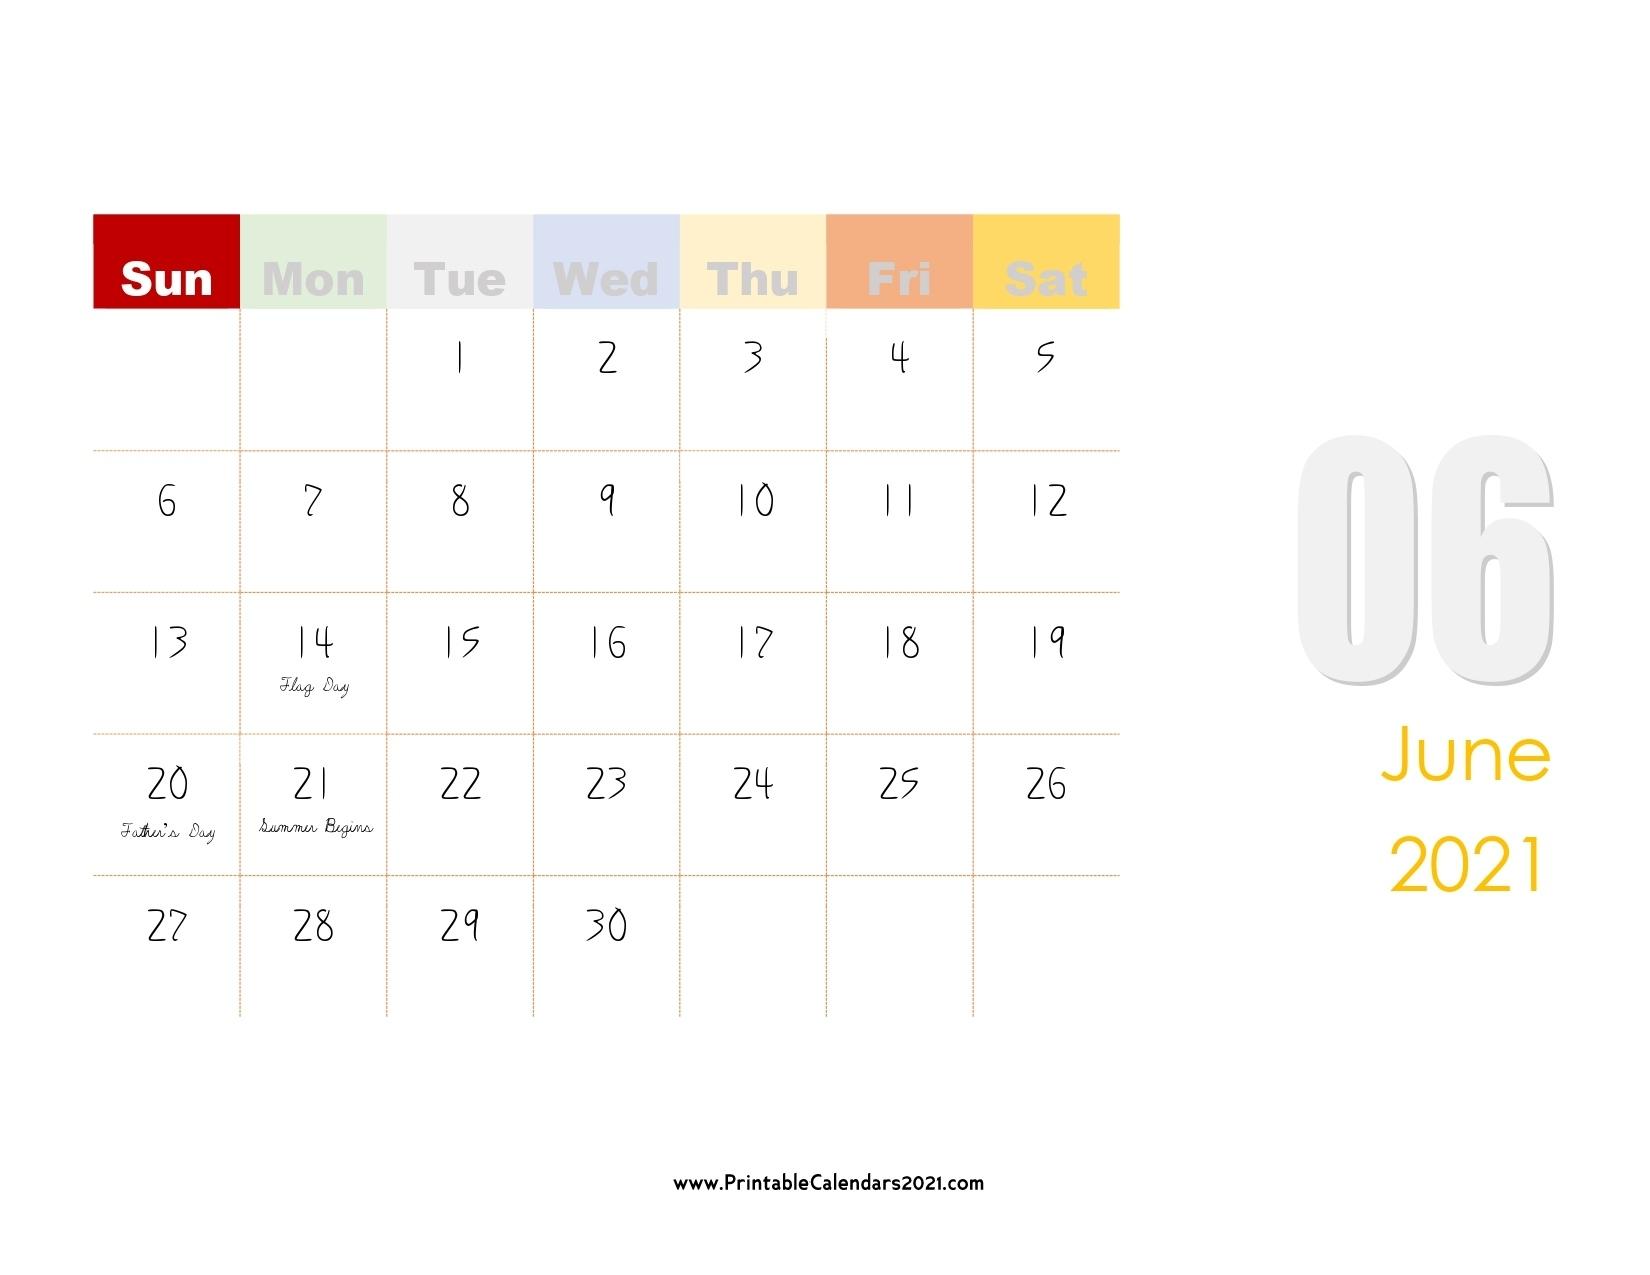 60+ Free June 2021 Calendar Printable With Holidays, Blank, Pdf June 2021 Calendar In Excel